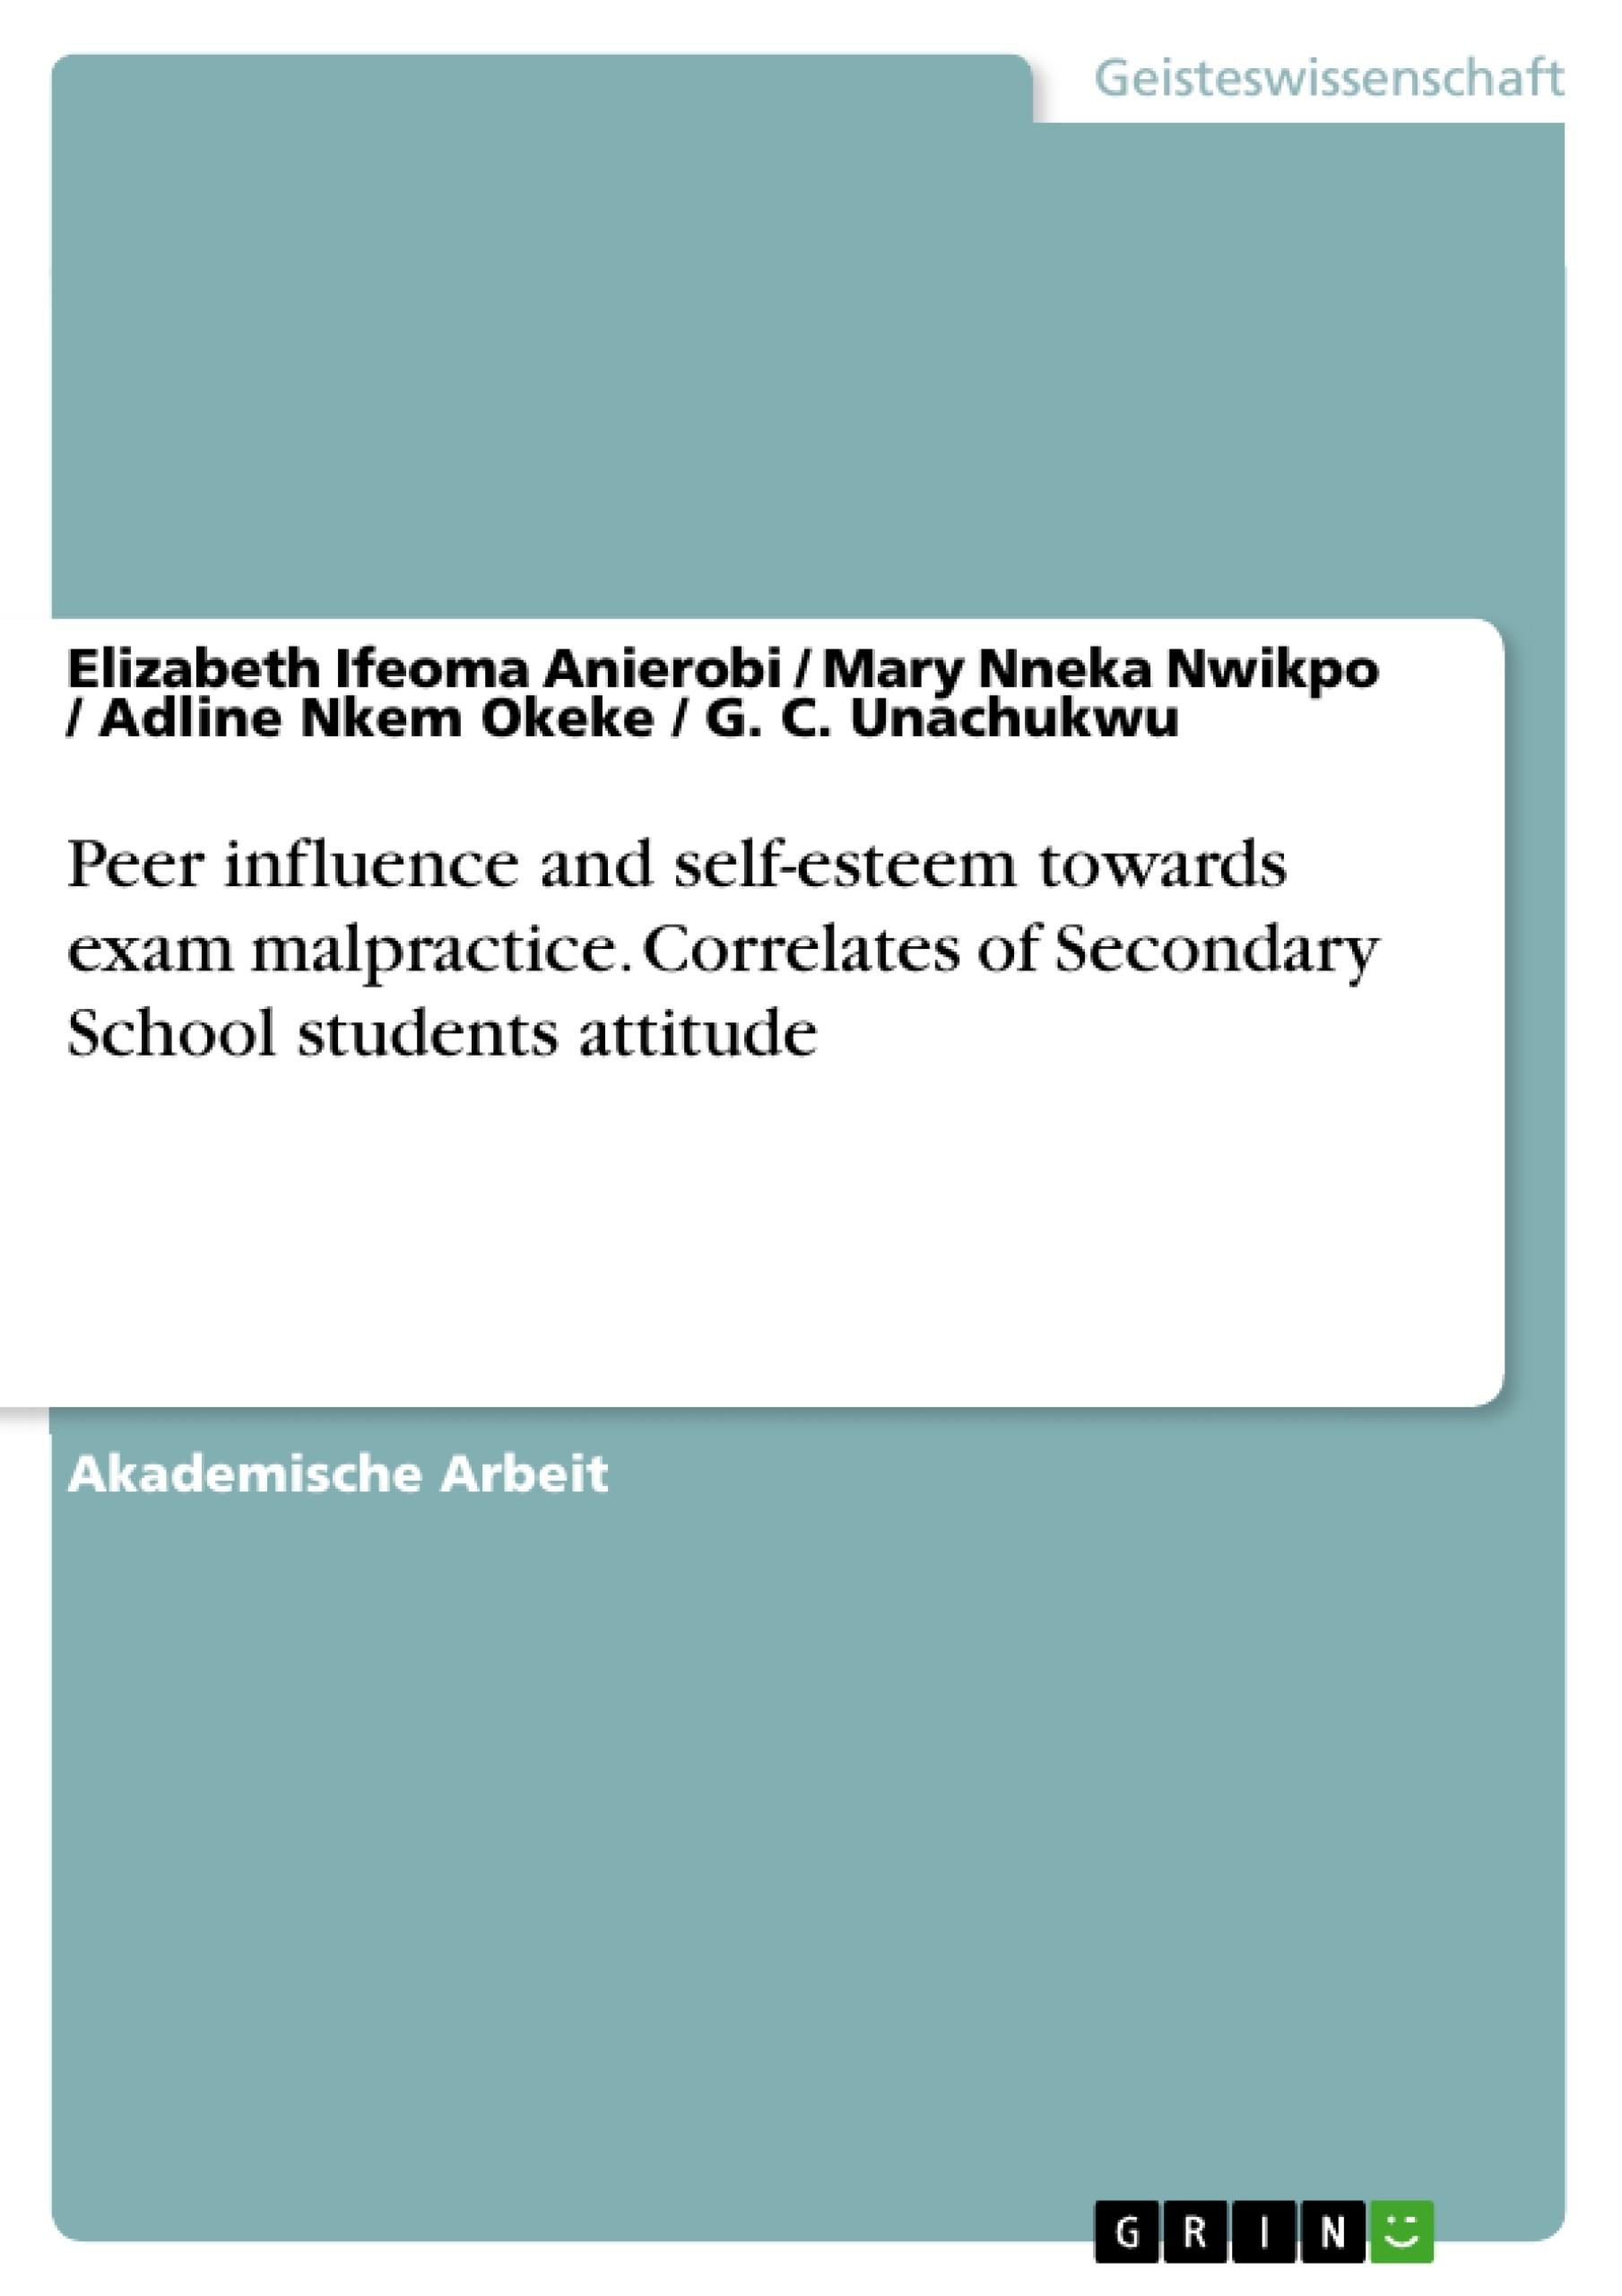 Titel: Peer influence and self-esteem towards exam malpractice. Correlates of Secondary School students attitude